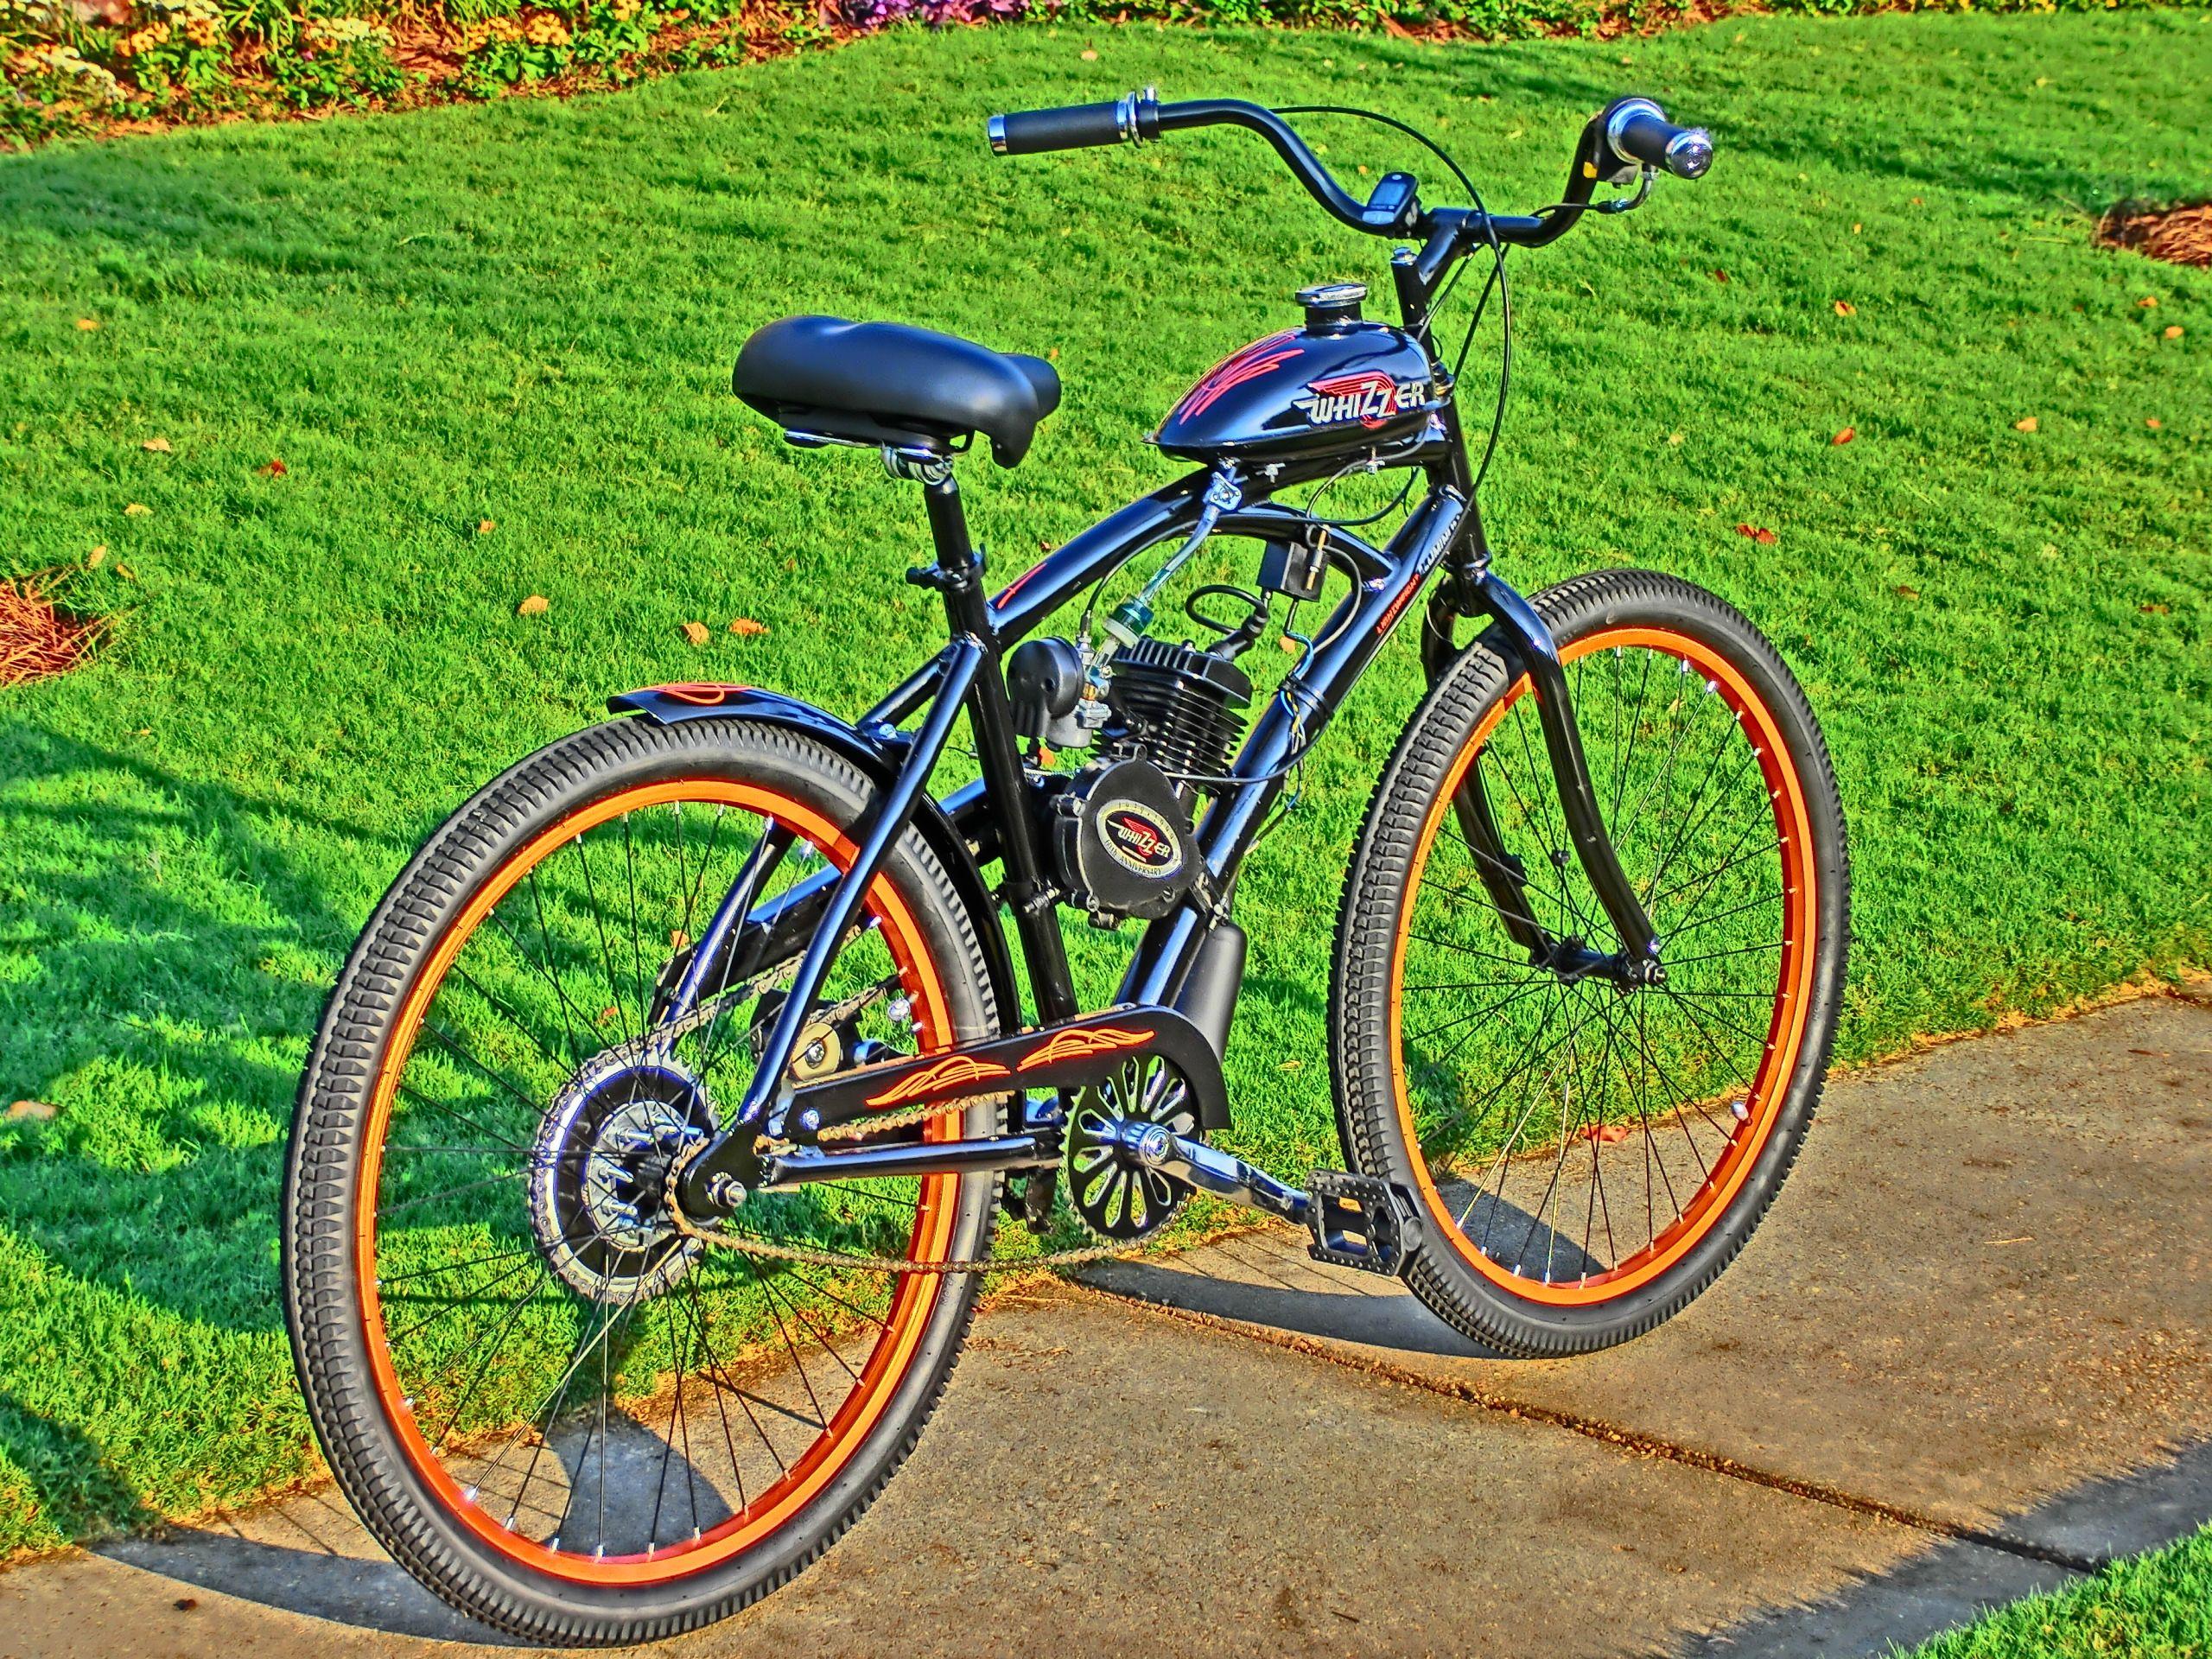 80cc Motorized Bike One Day Build From Boy Go Fast Engine